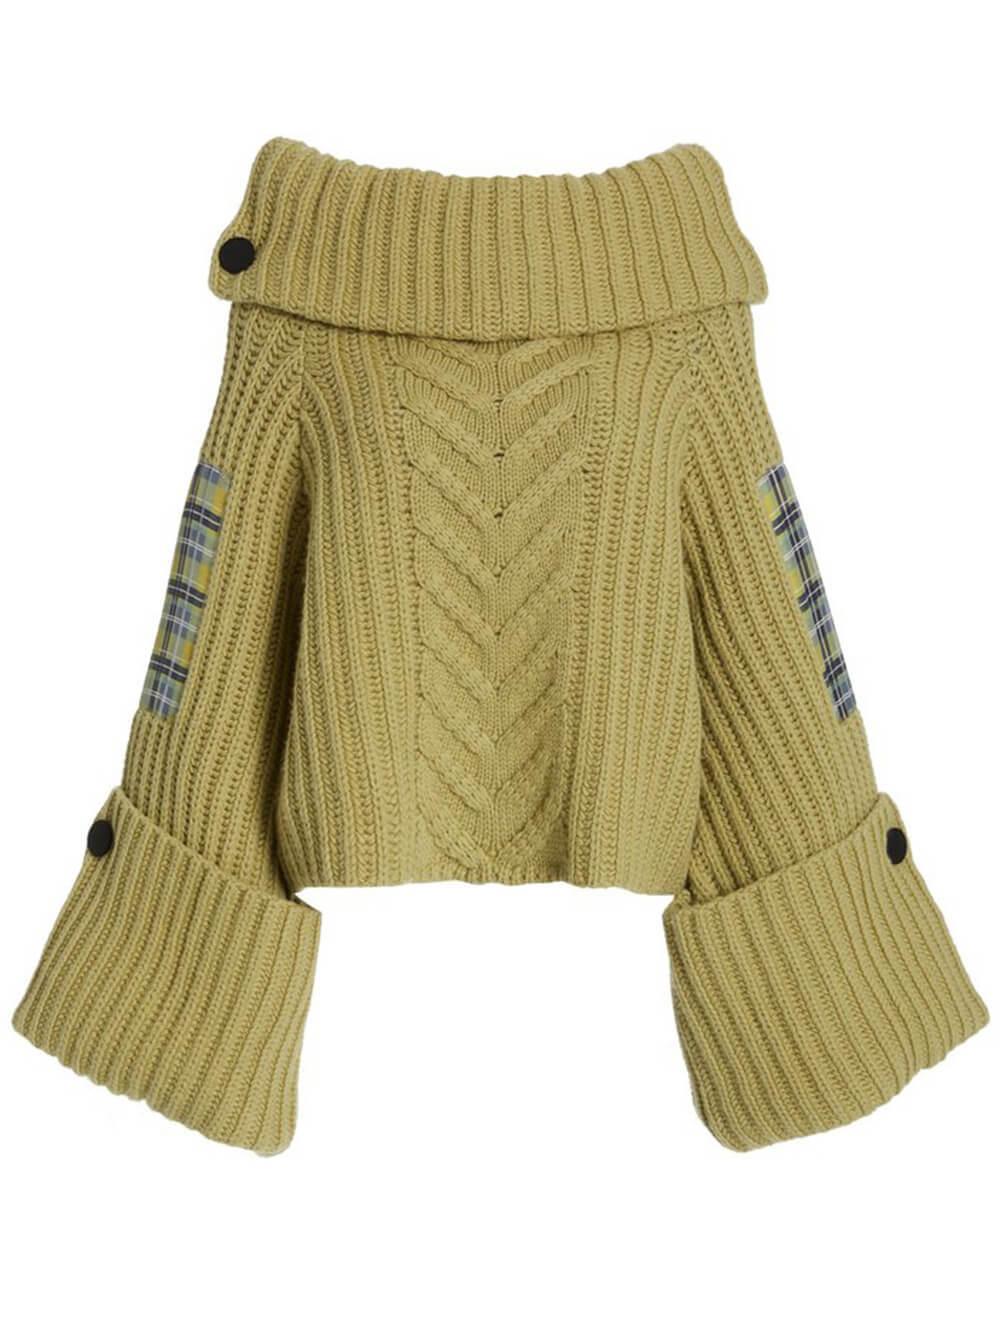 Missy Chunky Knit Sweater Item # HP21K110-98